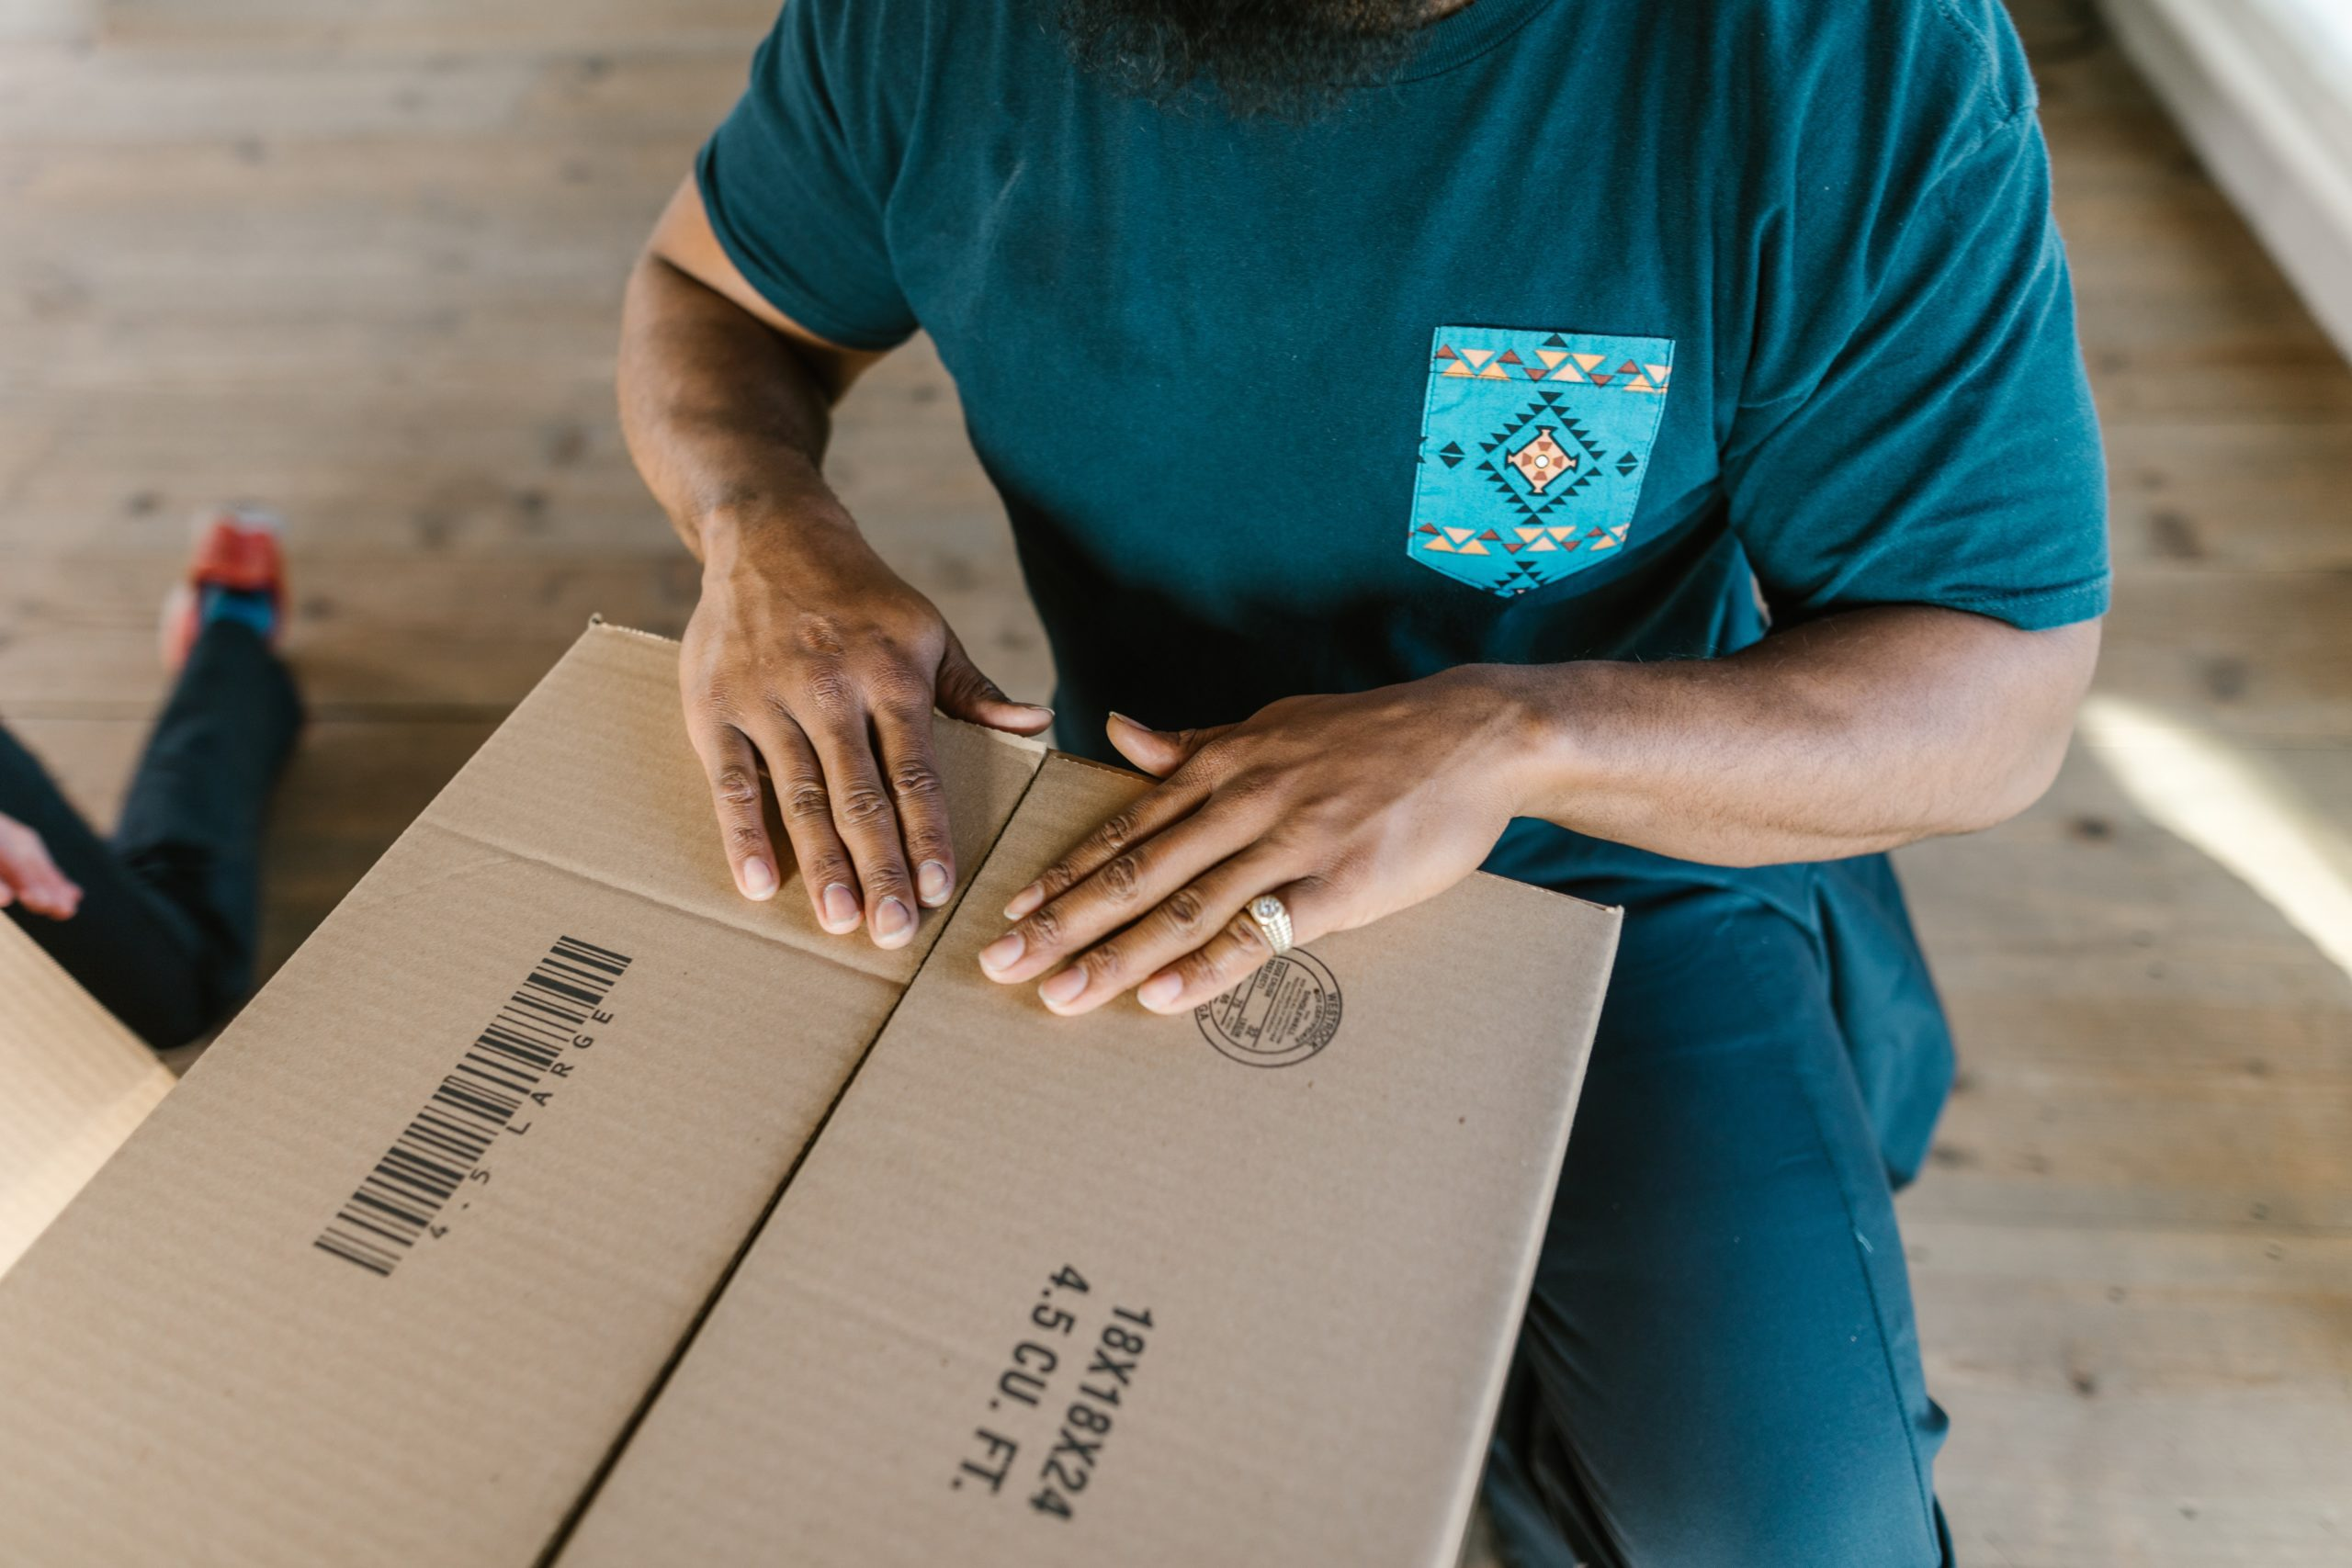 Man packing a brown box